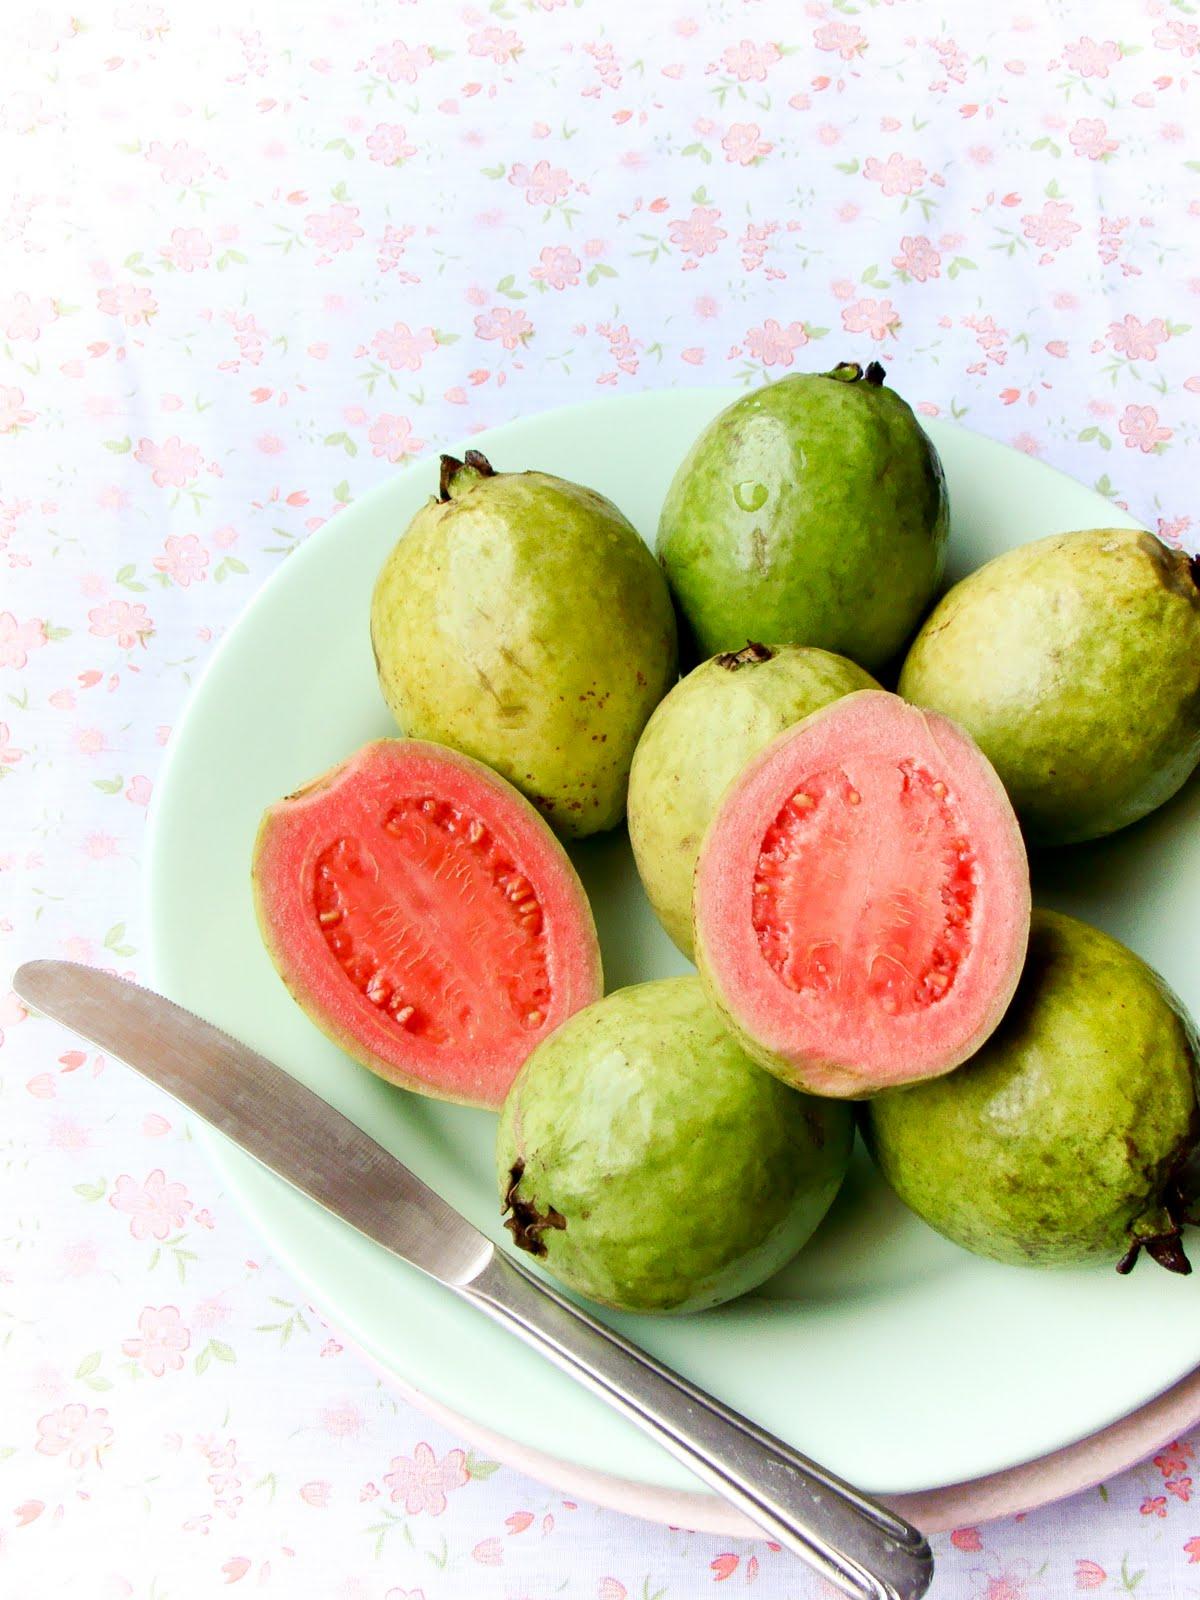 Guava for mobile